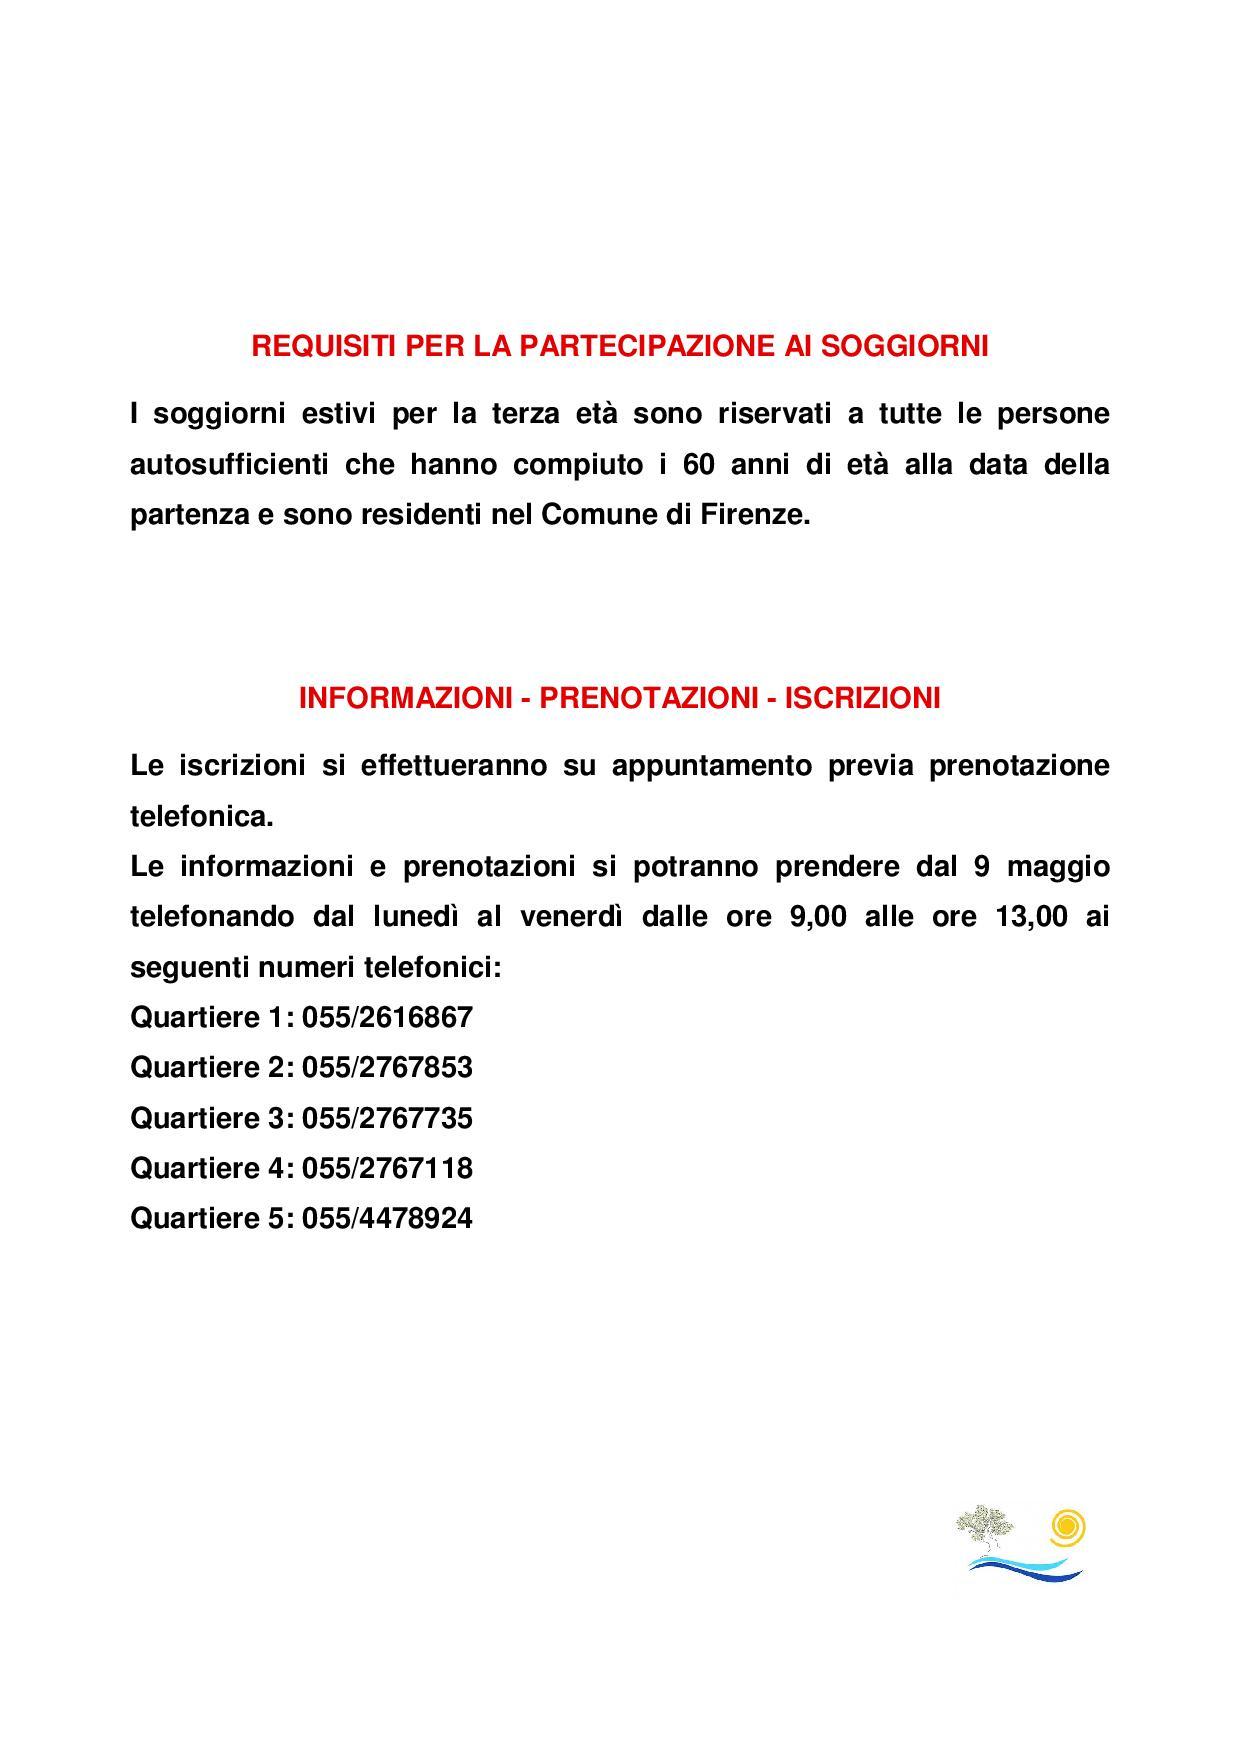 VOLANTINO-Vacanze Anziani 2016(1)-page-004